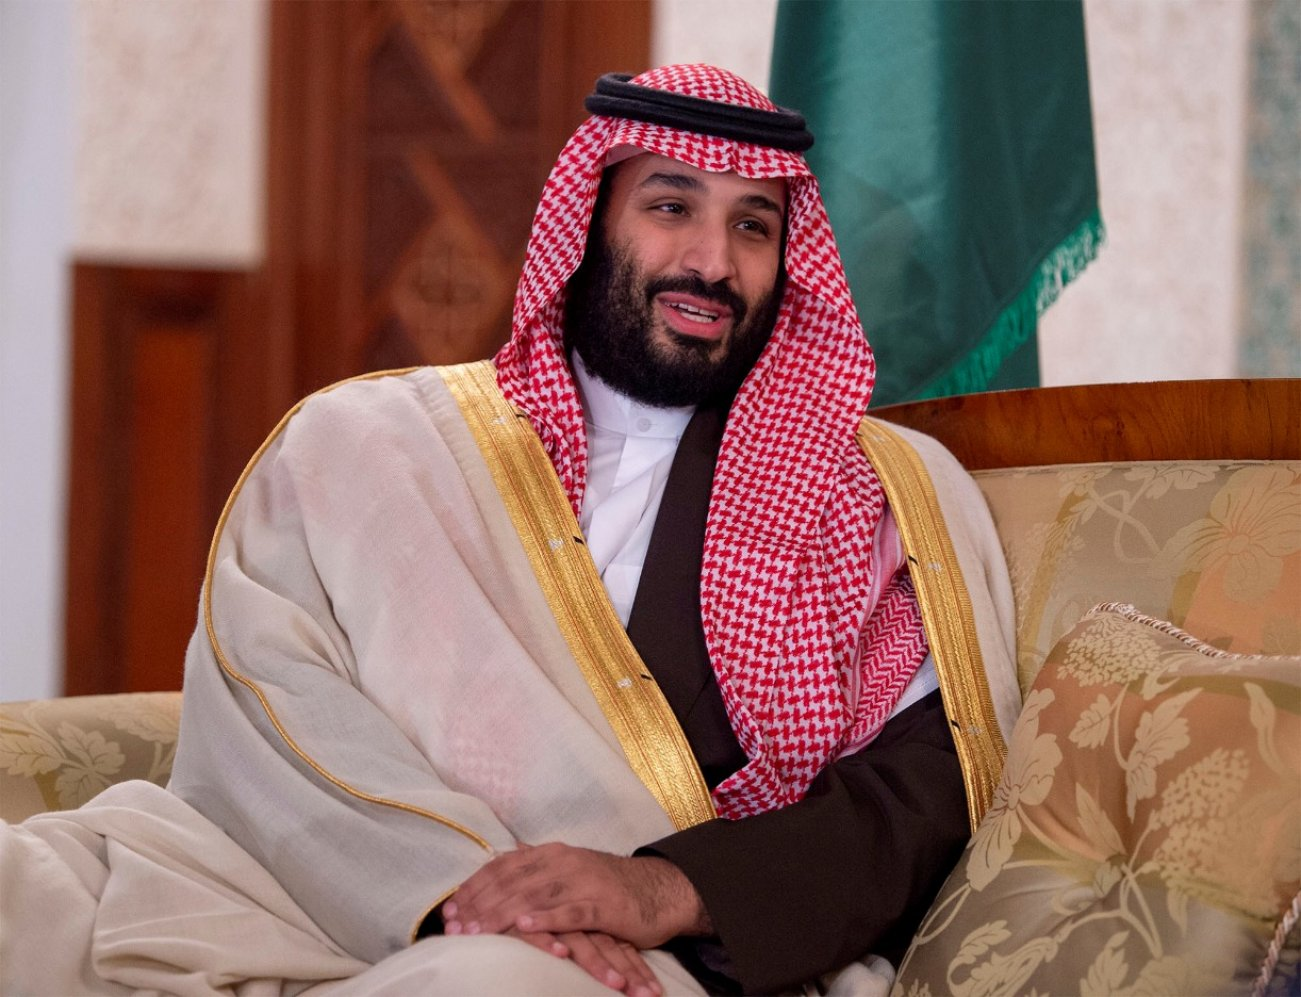 An Open Letter to President Biden: Let's 'Recalibrate' Saudi-U.S. Ties as Friends, Not Foes